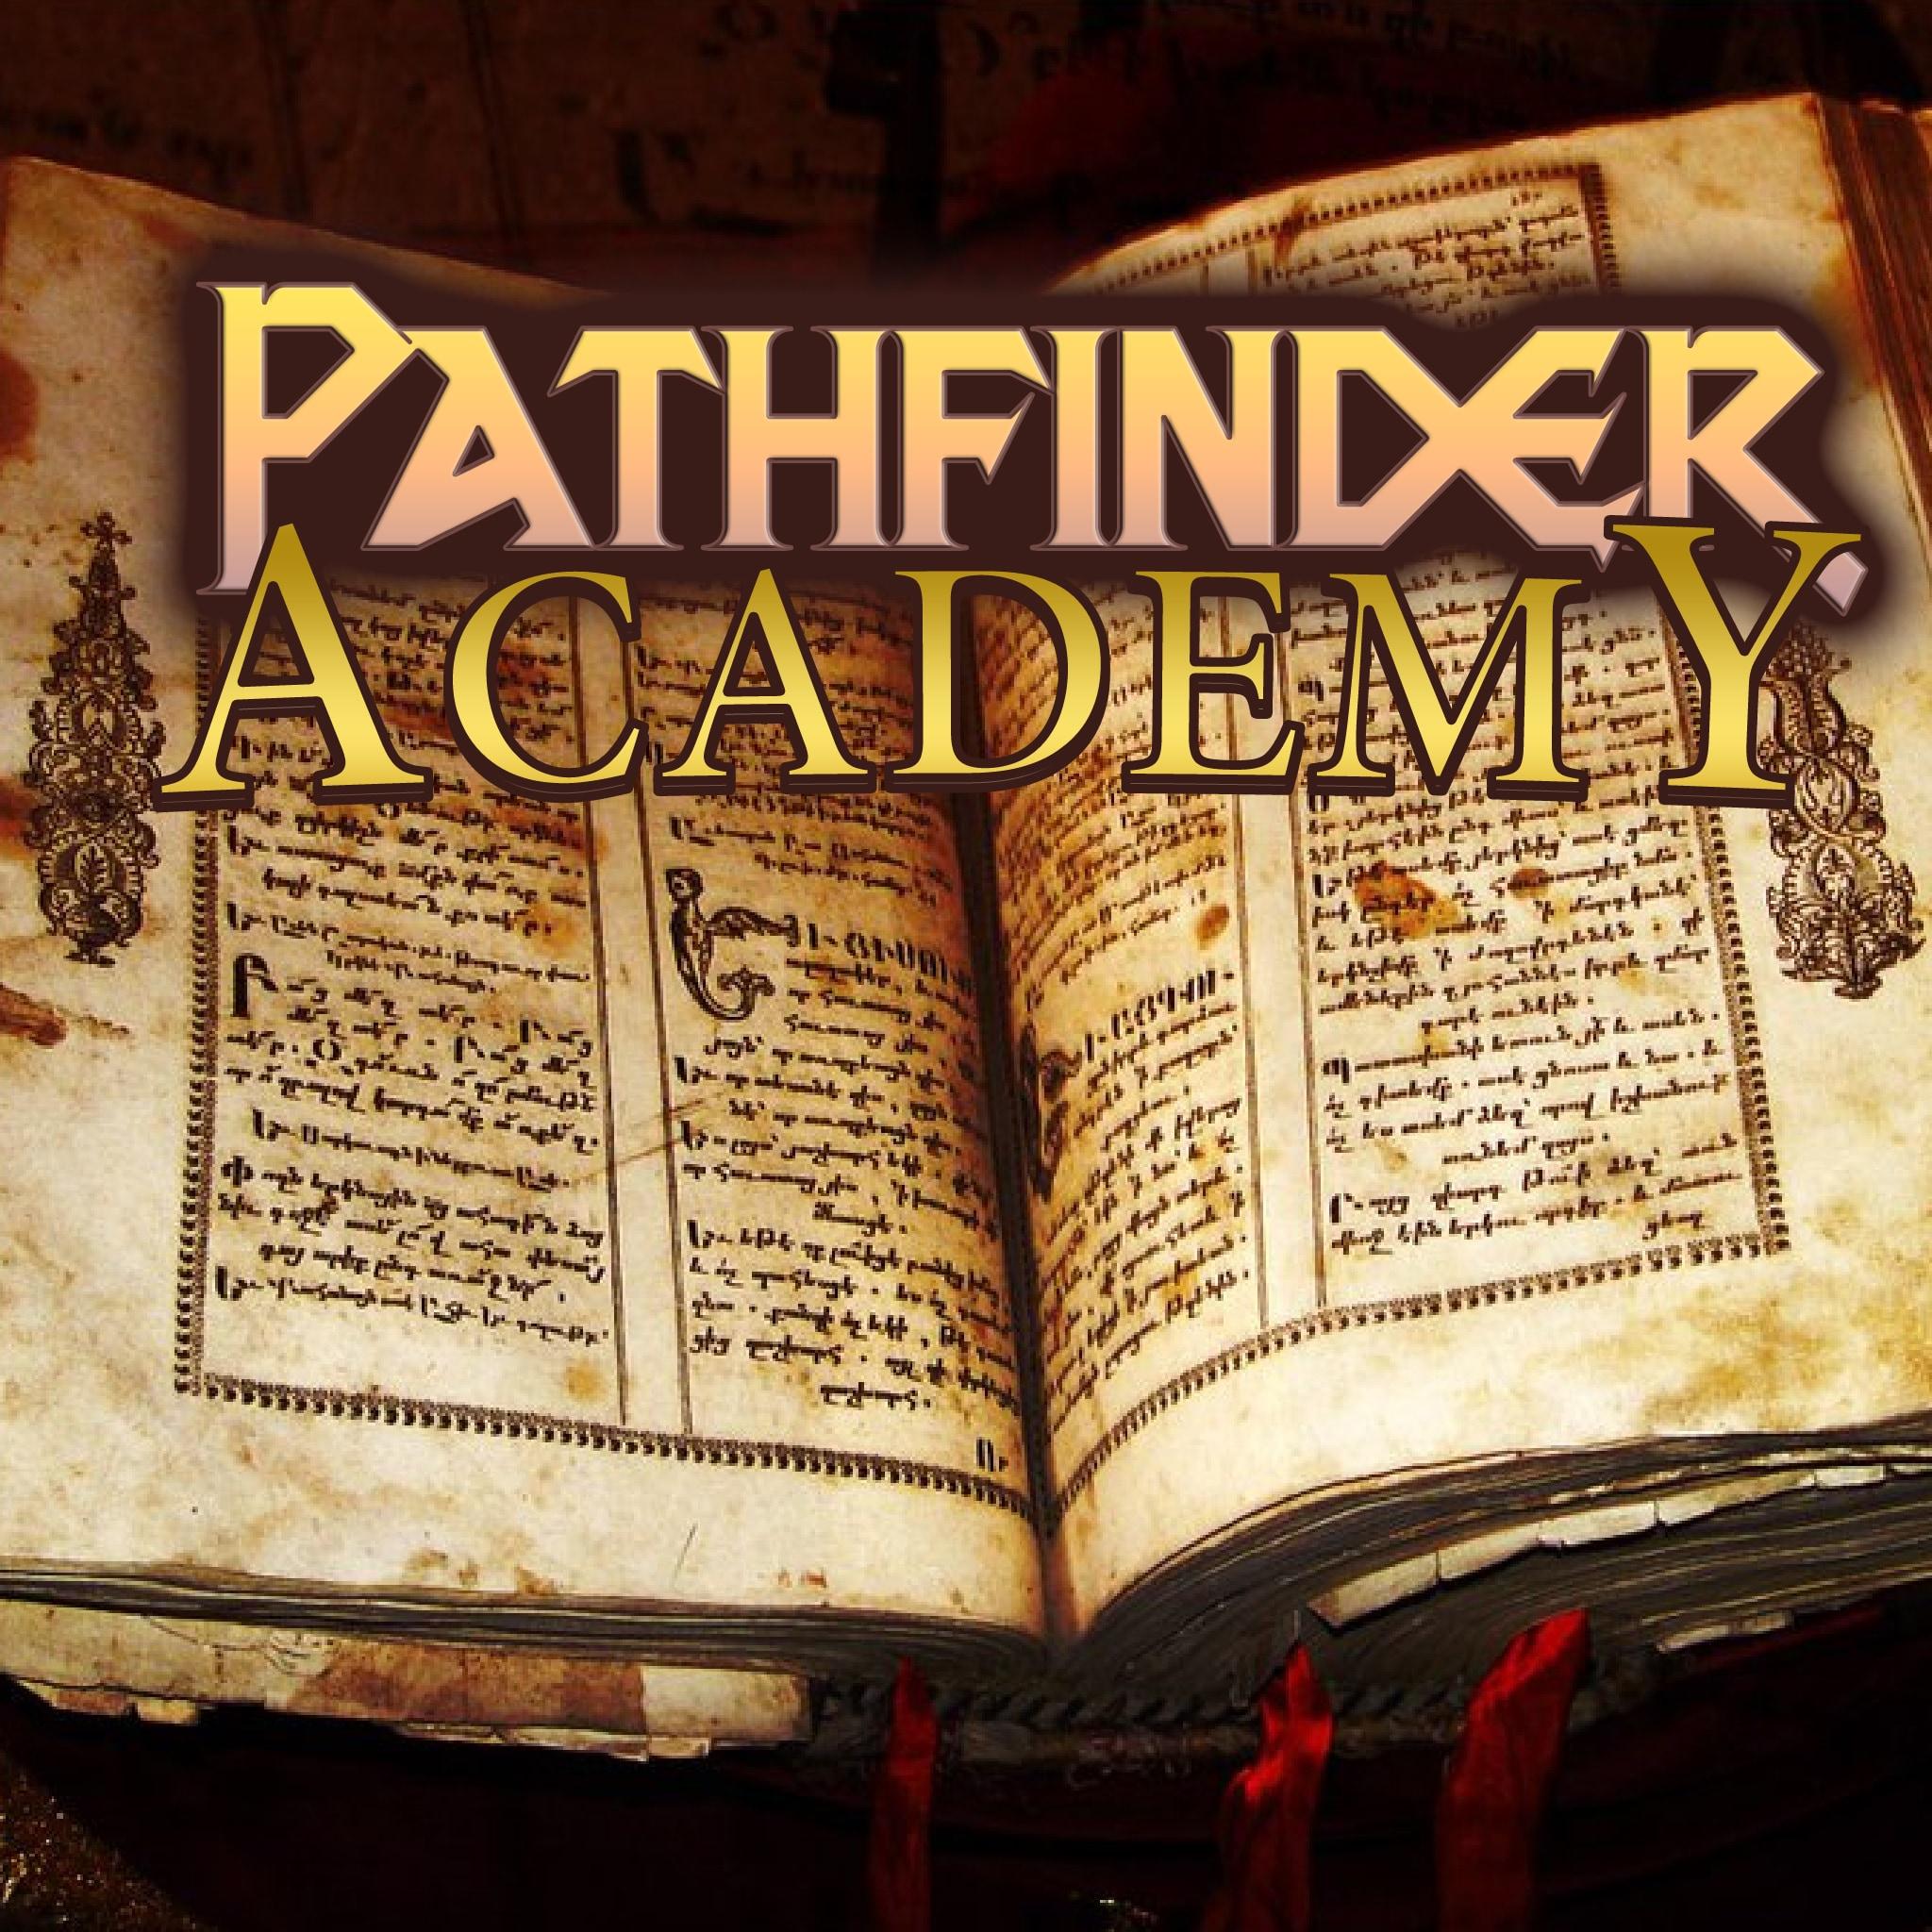 Pathfinder Academy logo